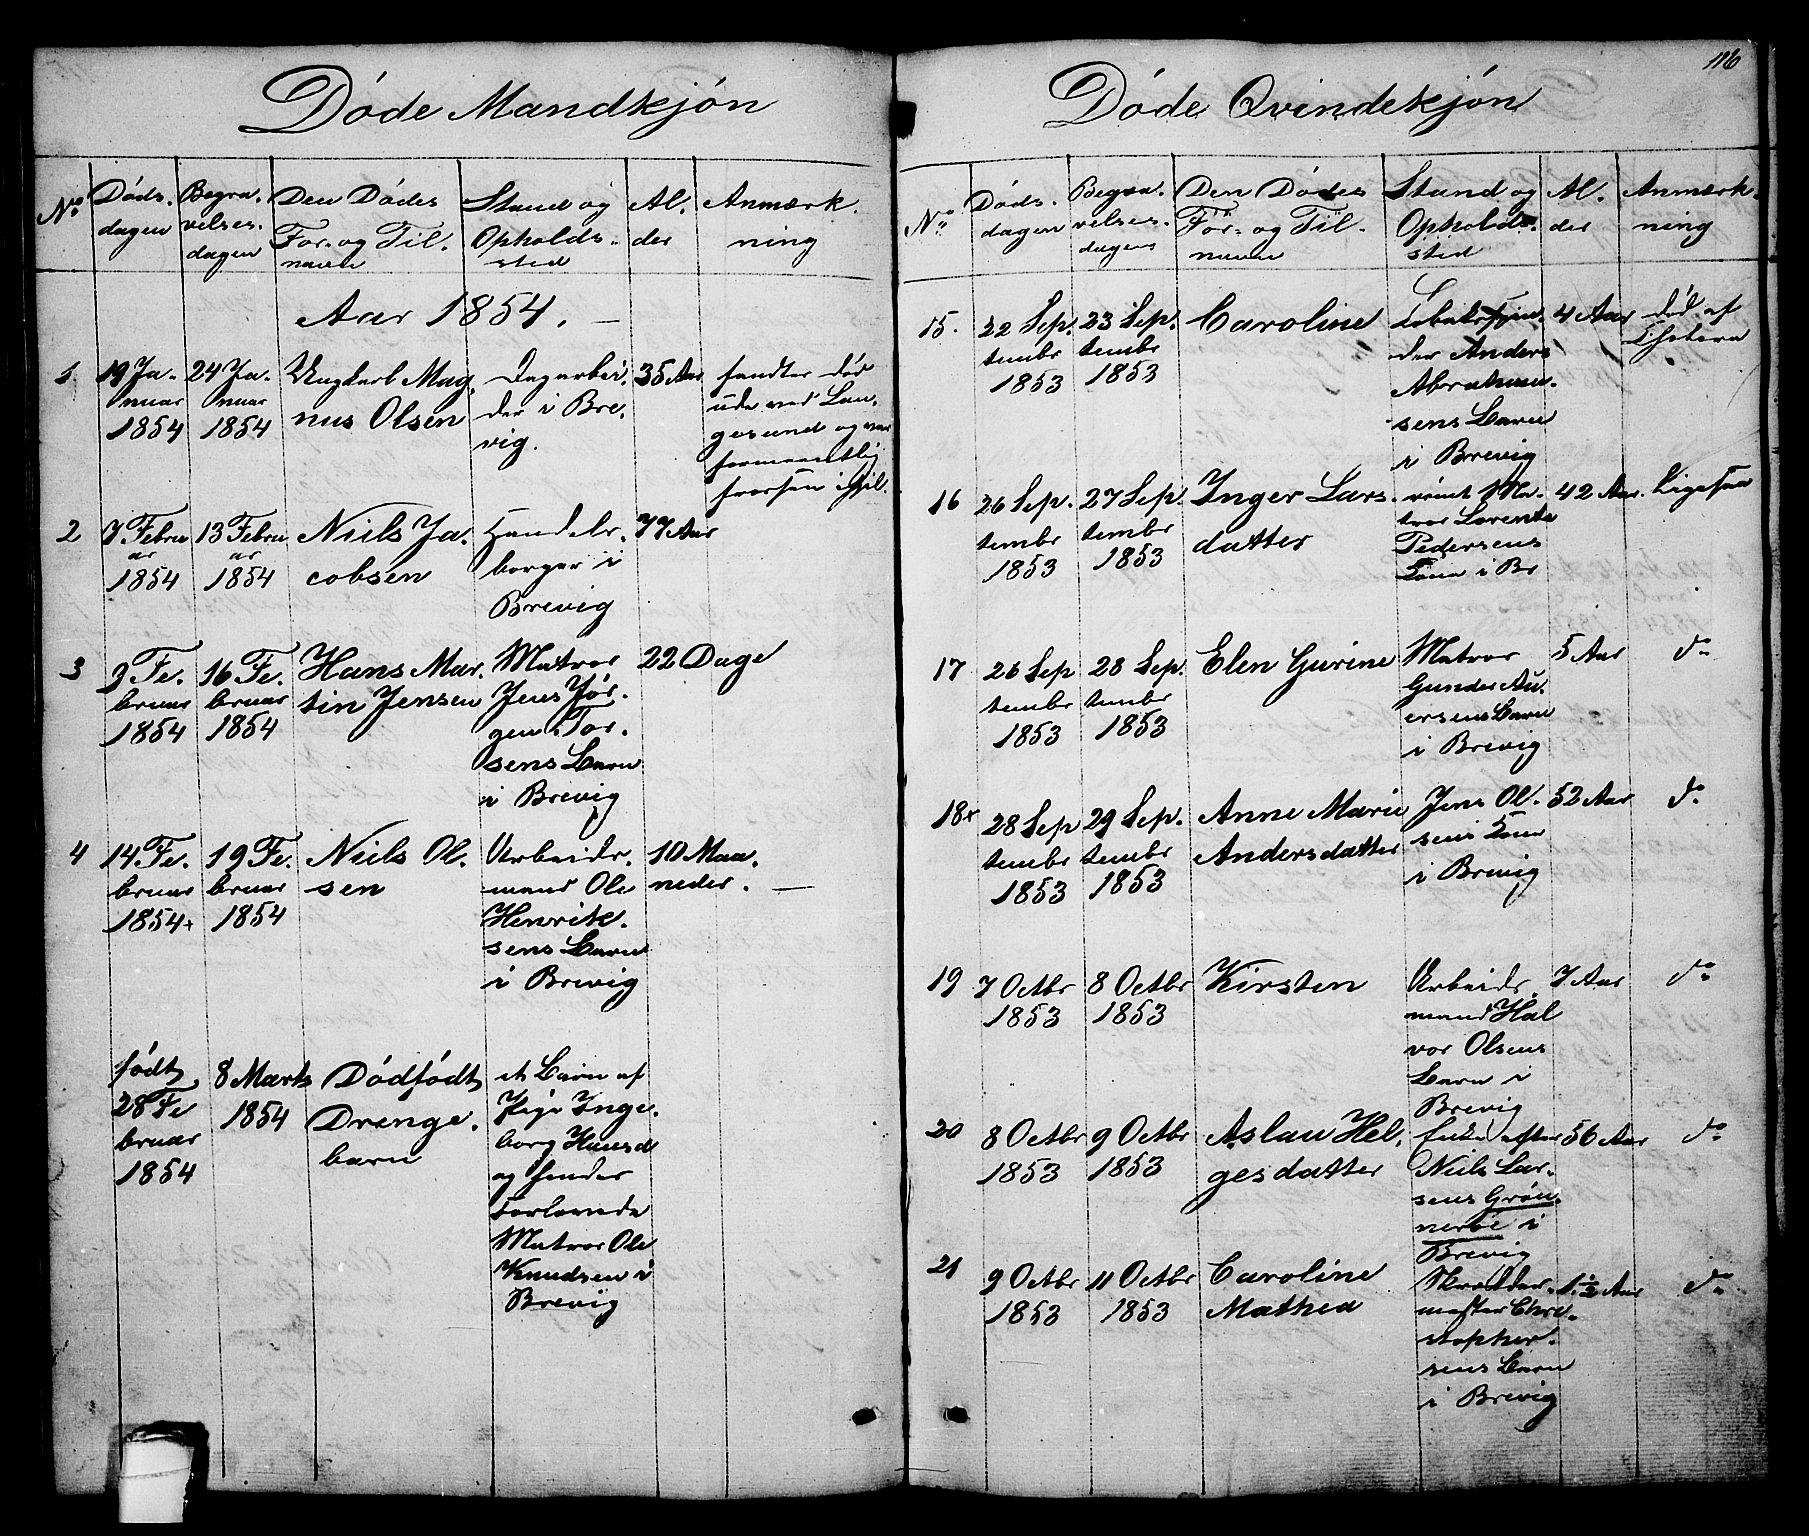 SAKO, Brevik kirkebøker, G/Ga/L0002: Klokkerbok nr. 2, 1846-1865, s. 116